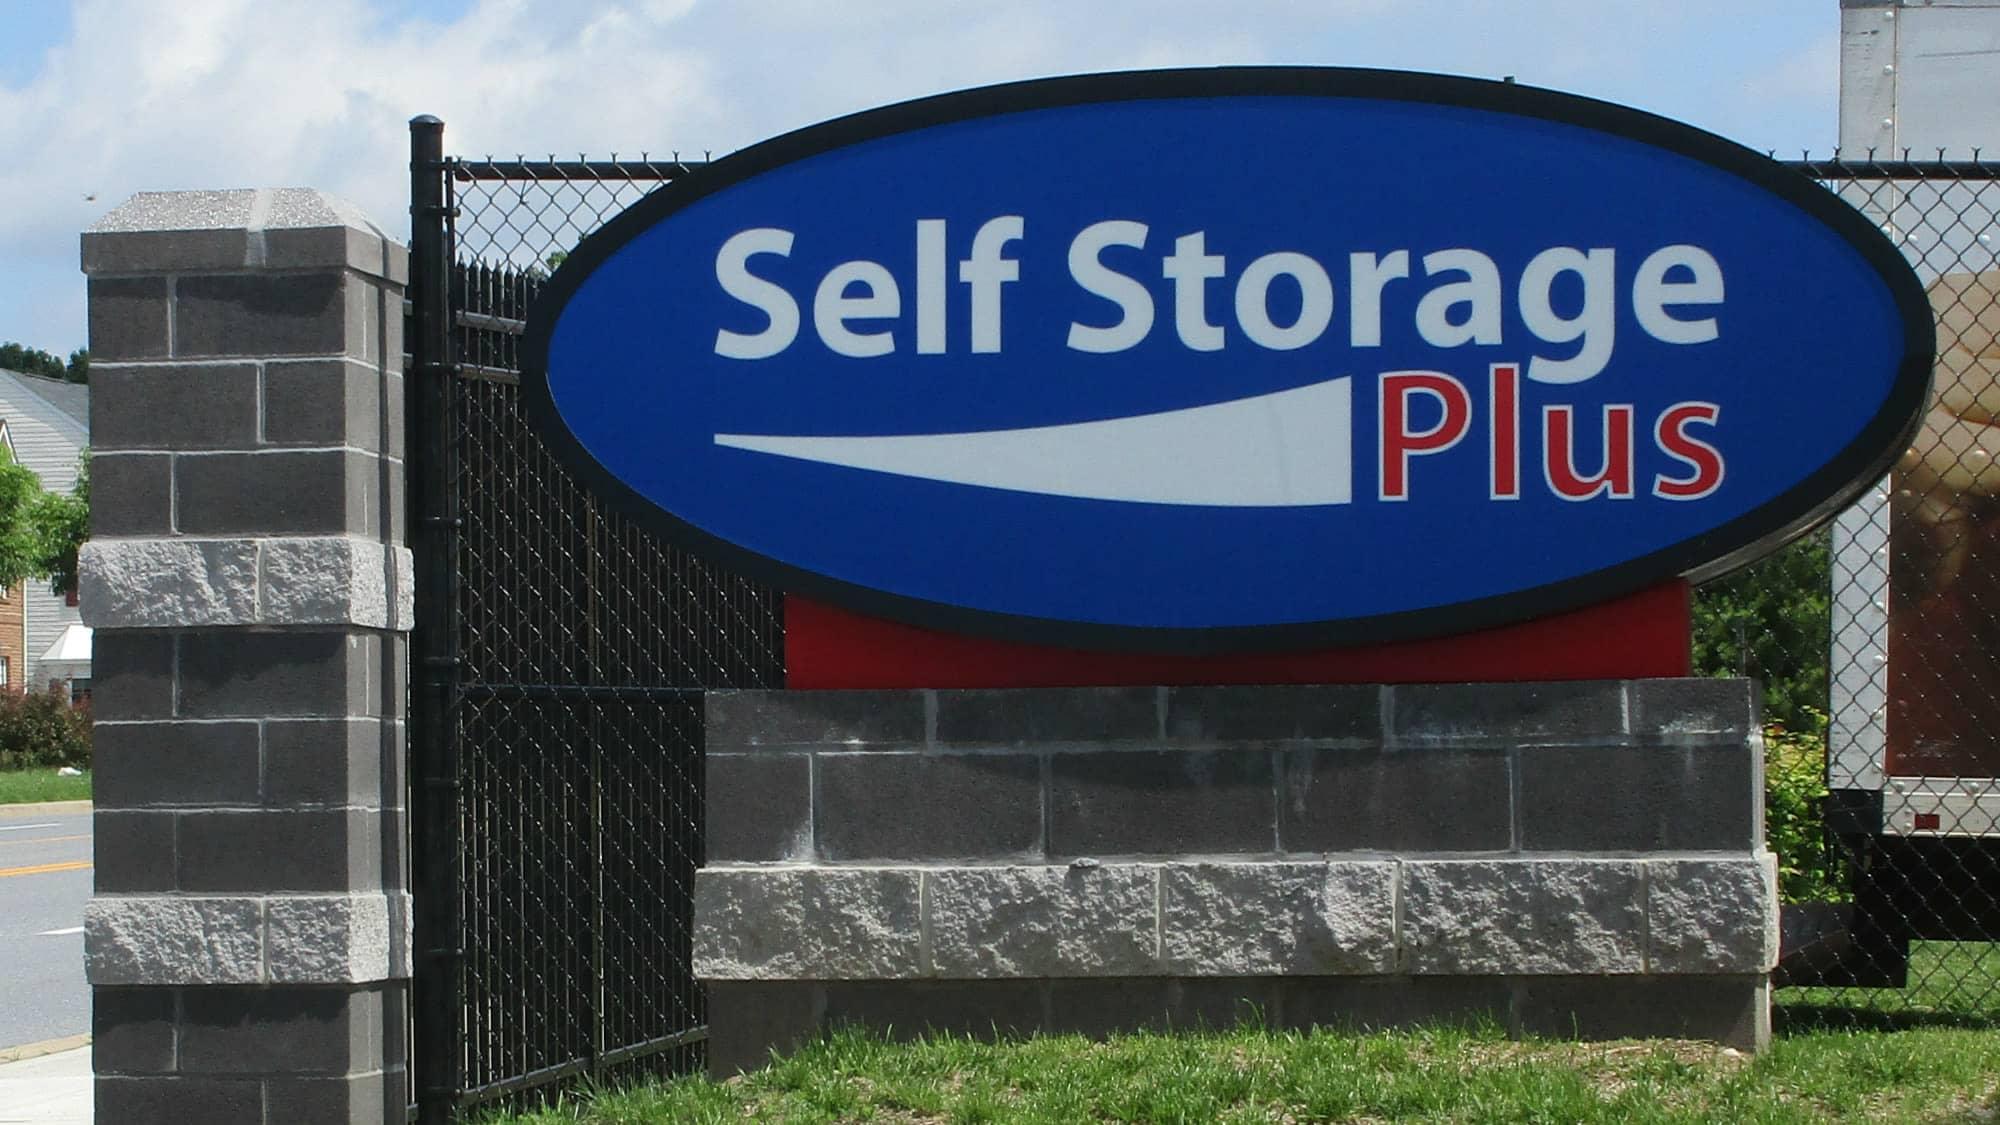 Self Storage Plus welcome sign in Owings Mills